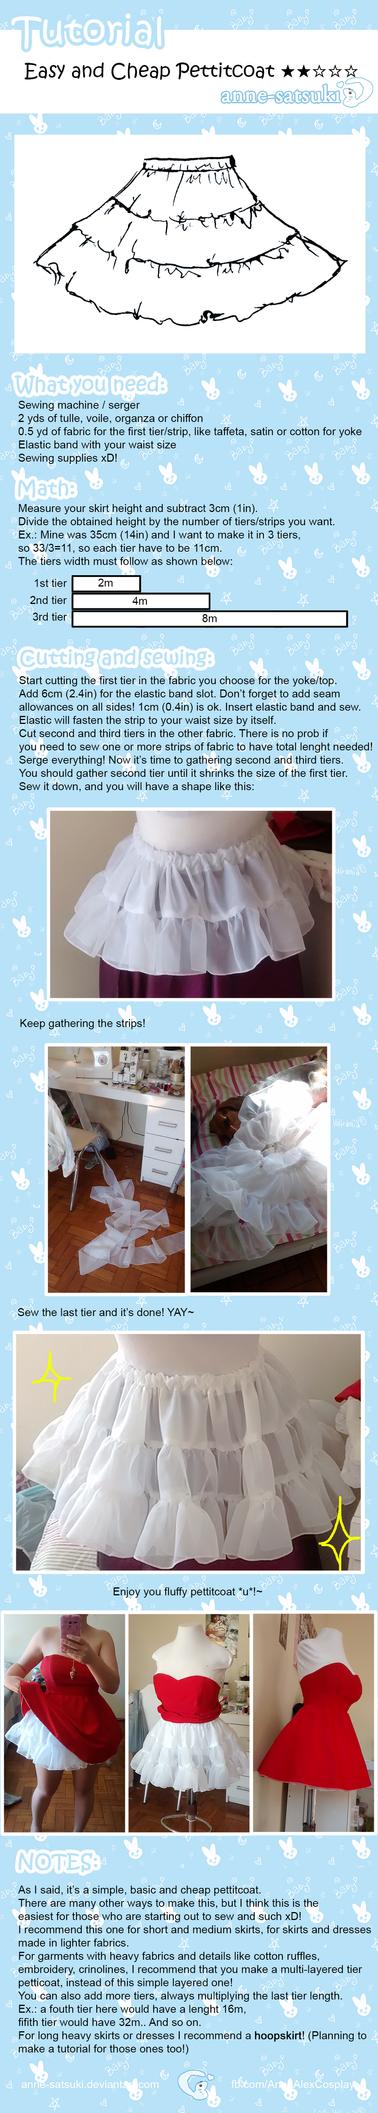 Easy Pettitcoat Tutorial by anne-satsuki